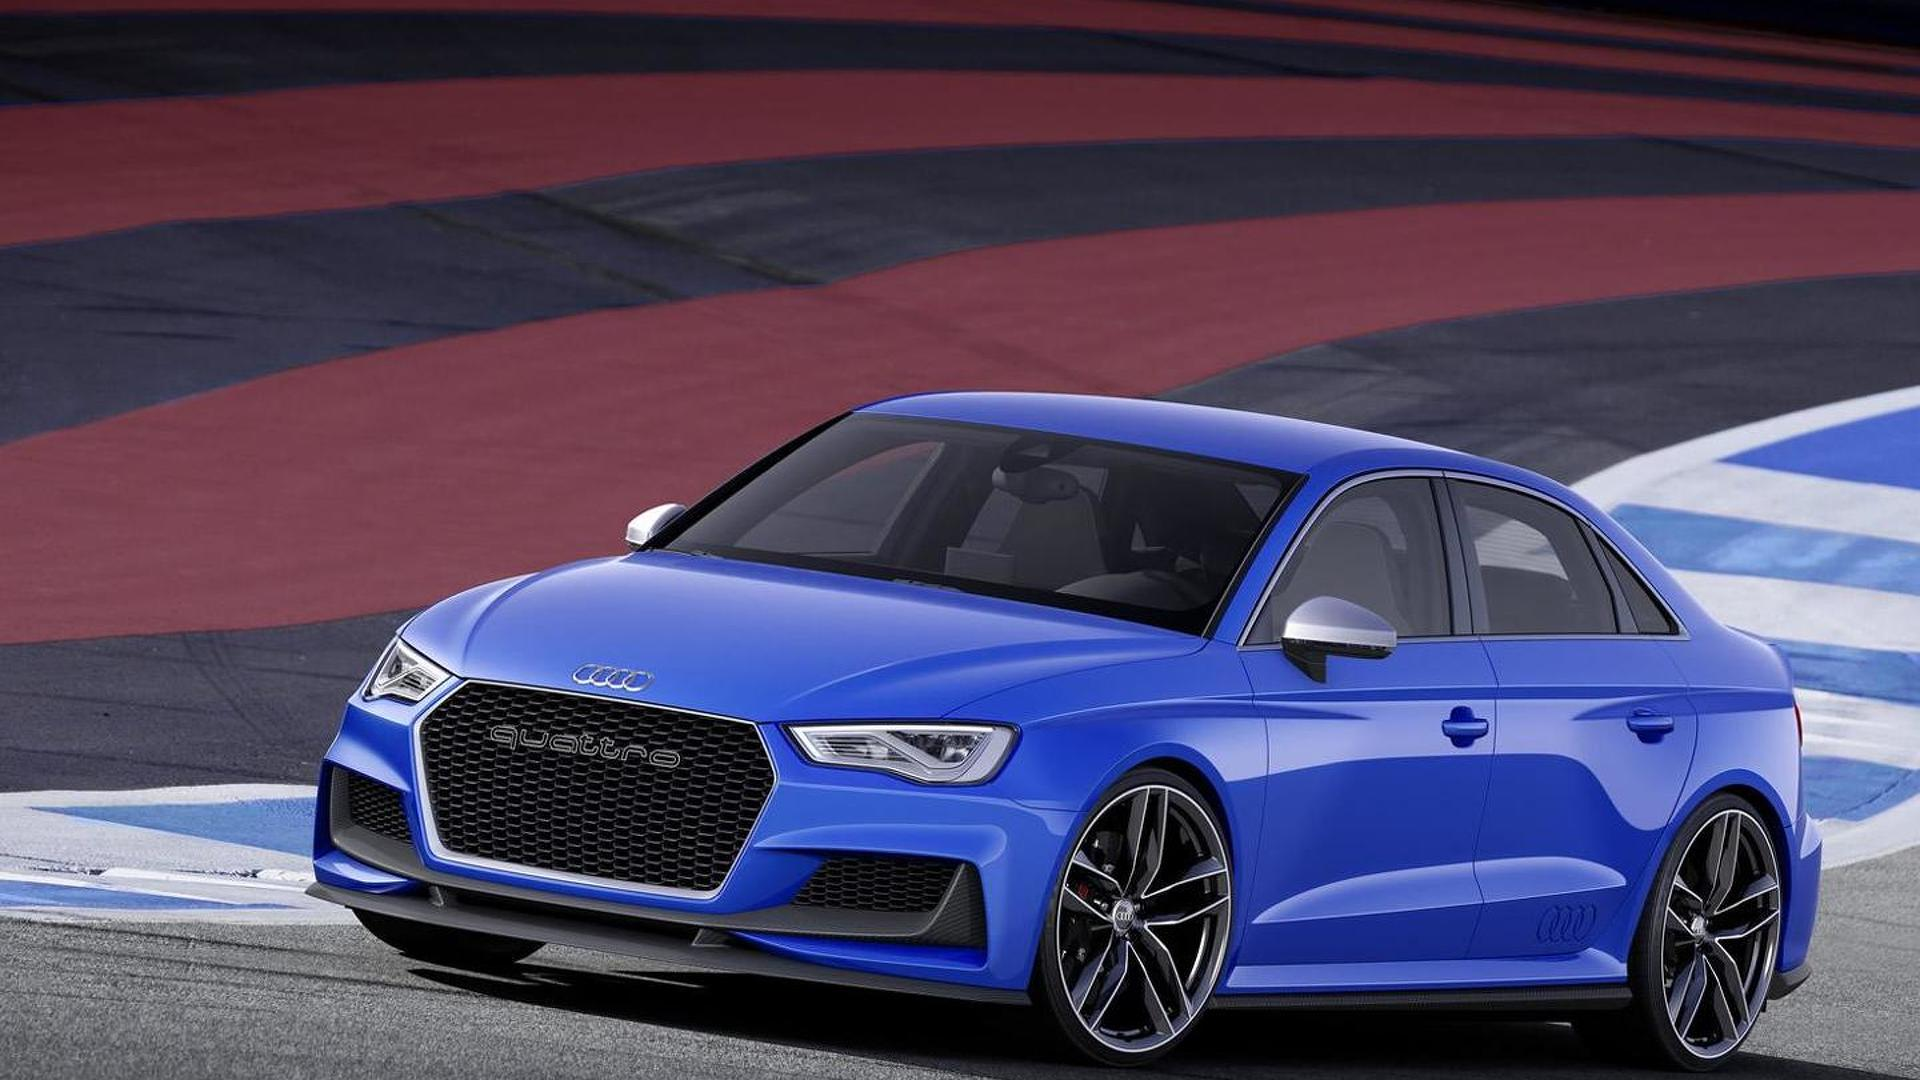 Audi unveils hardcore A3 clubsport quattro concept with 525 PS